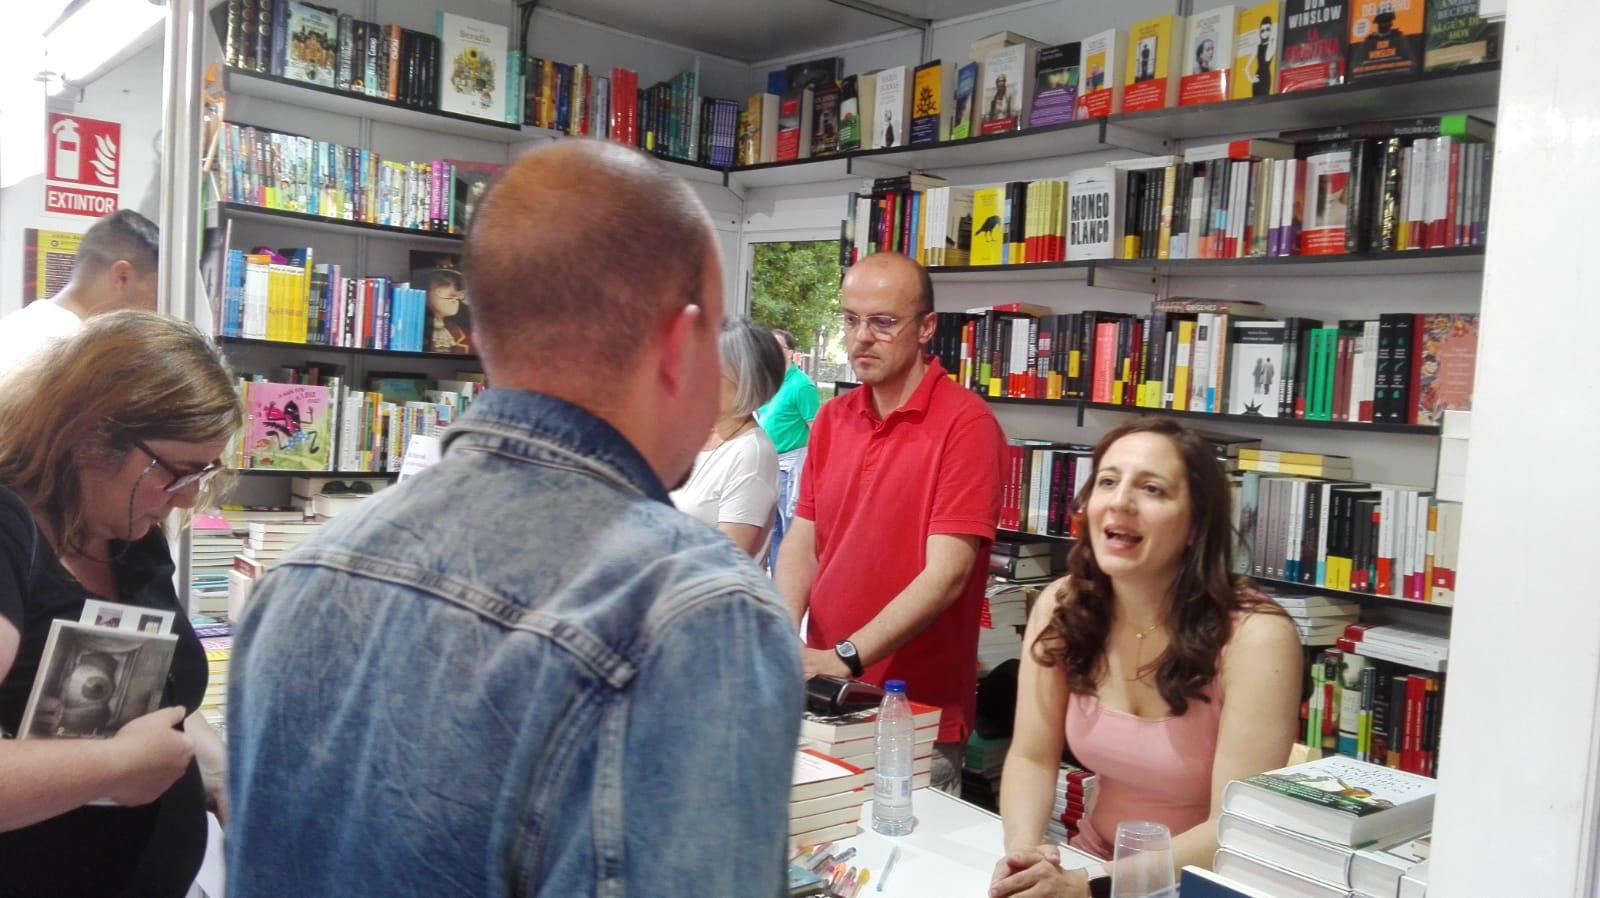 Ana Lena, otra escritora de Majadahonda que triunfa en la Feria del Libro de Madrid 2019